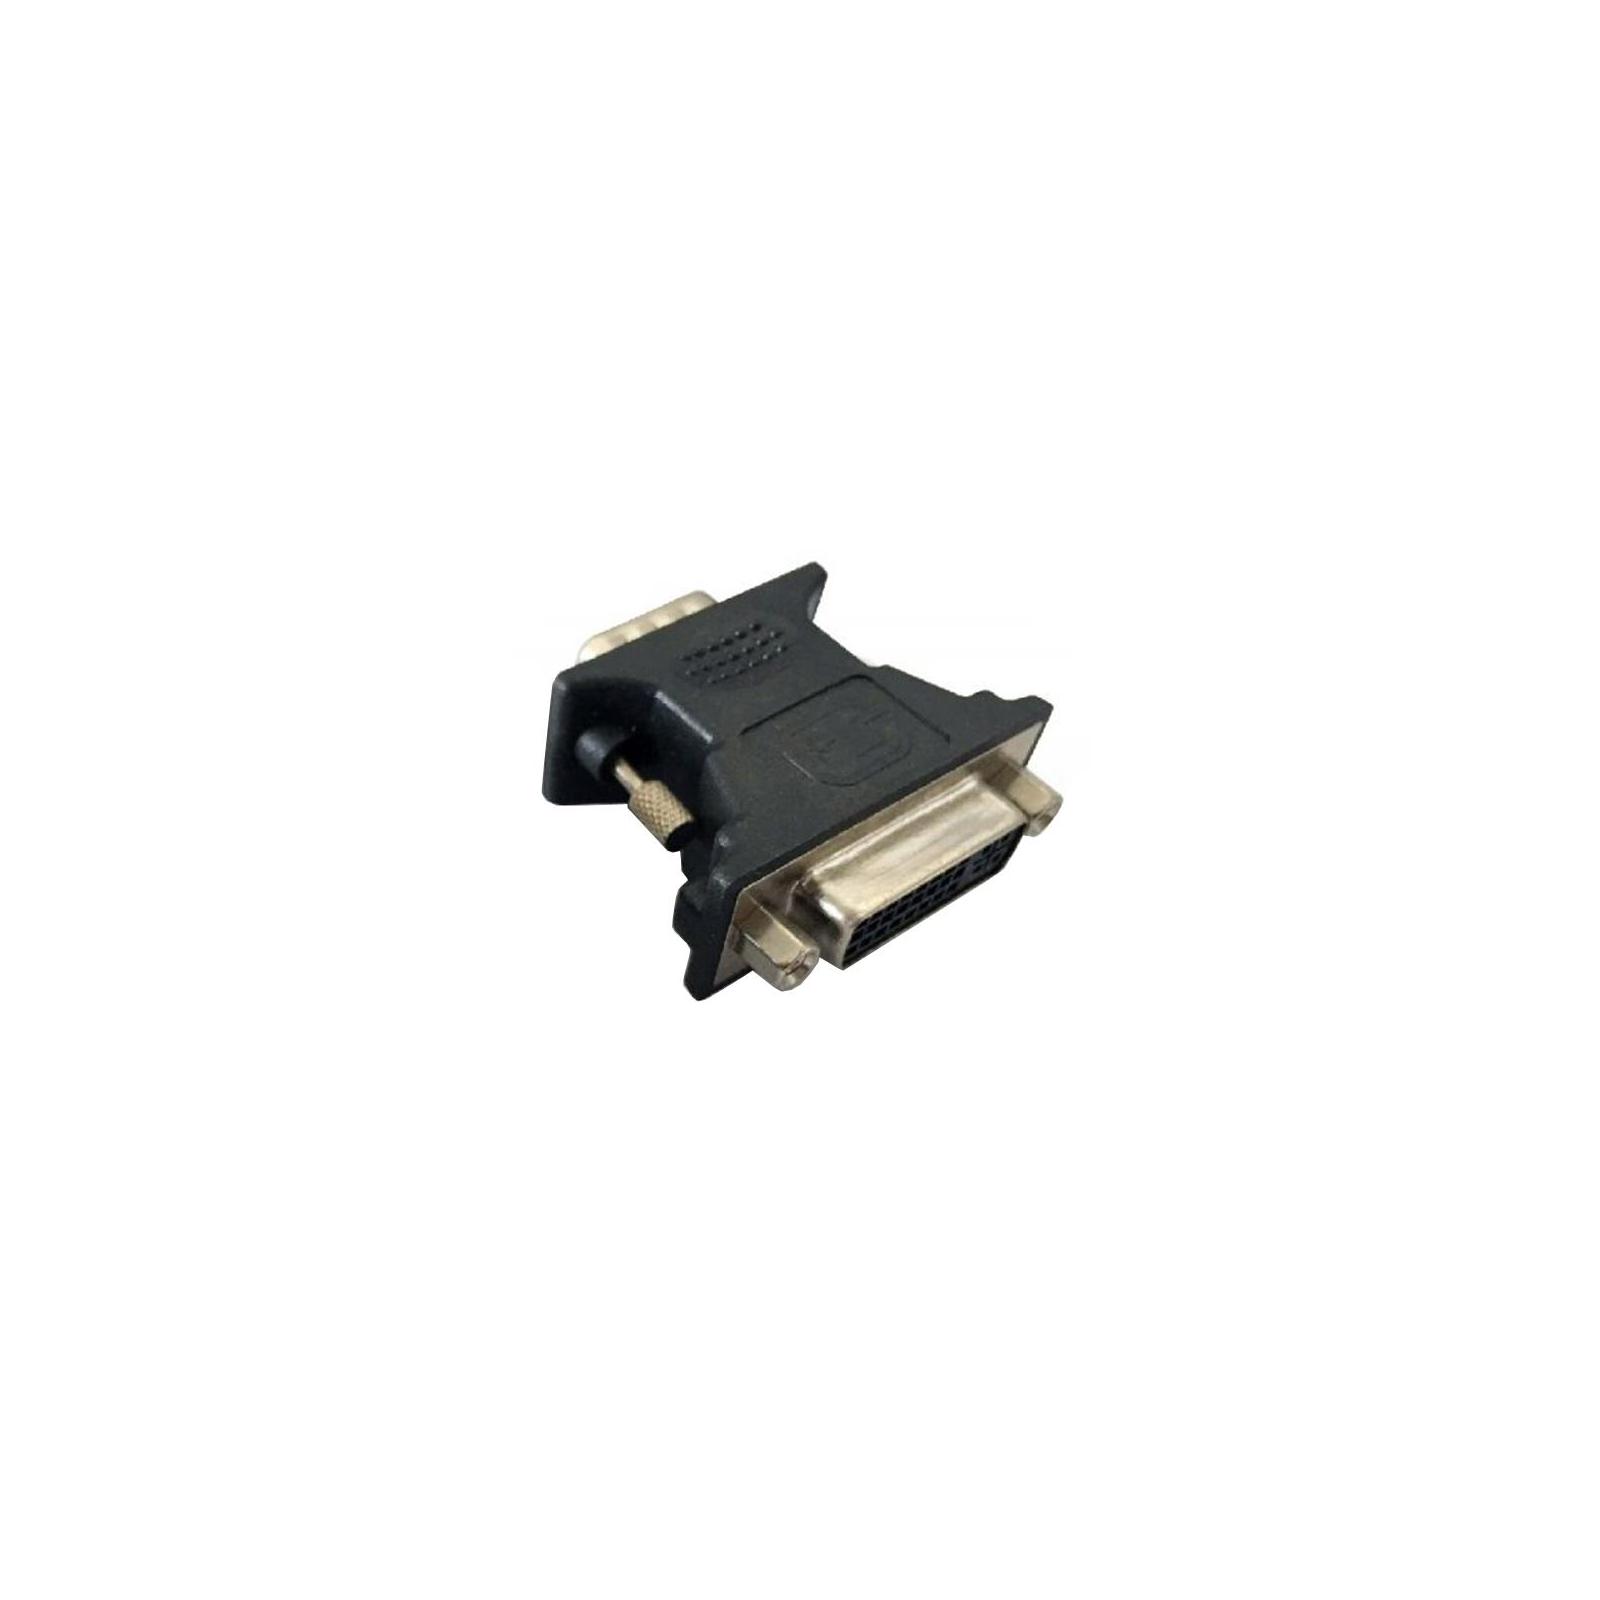 Переходник DVI-A 24-pin to VGA Cablexpert (A-VGAM-DVIF-01)